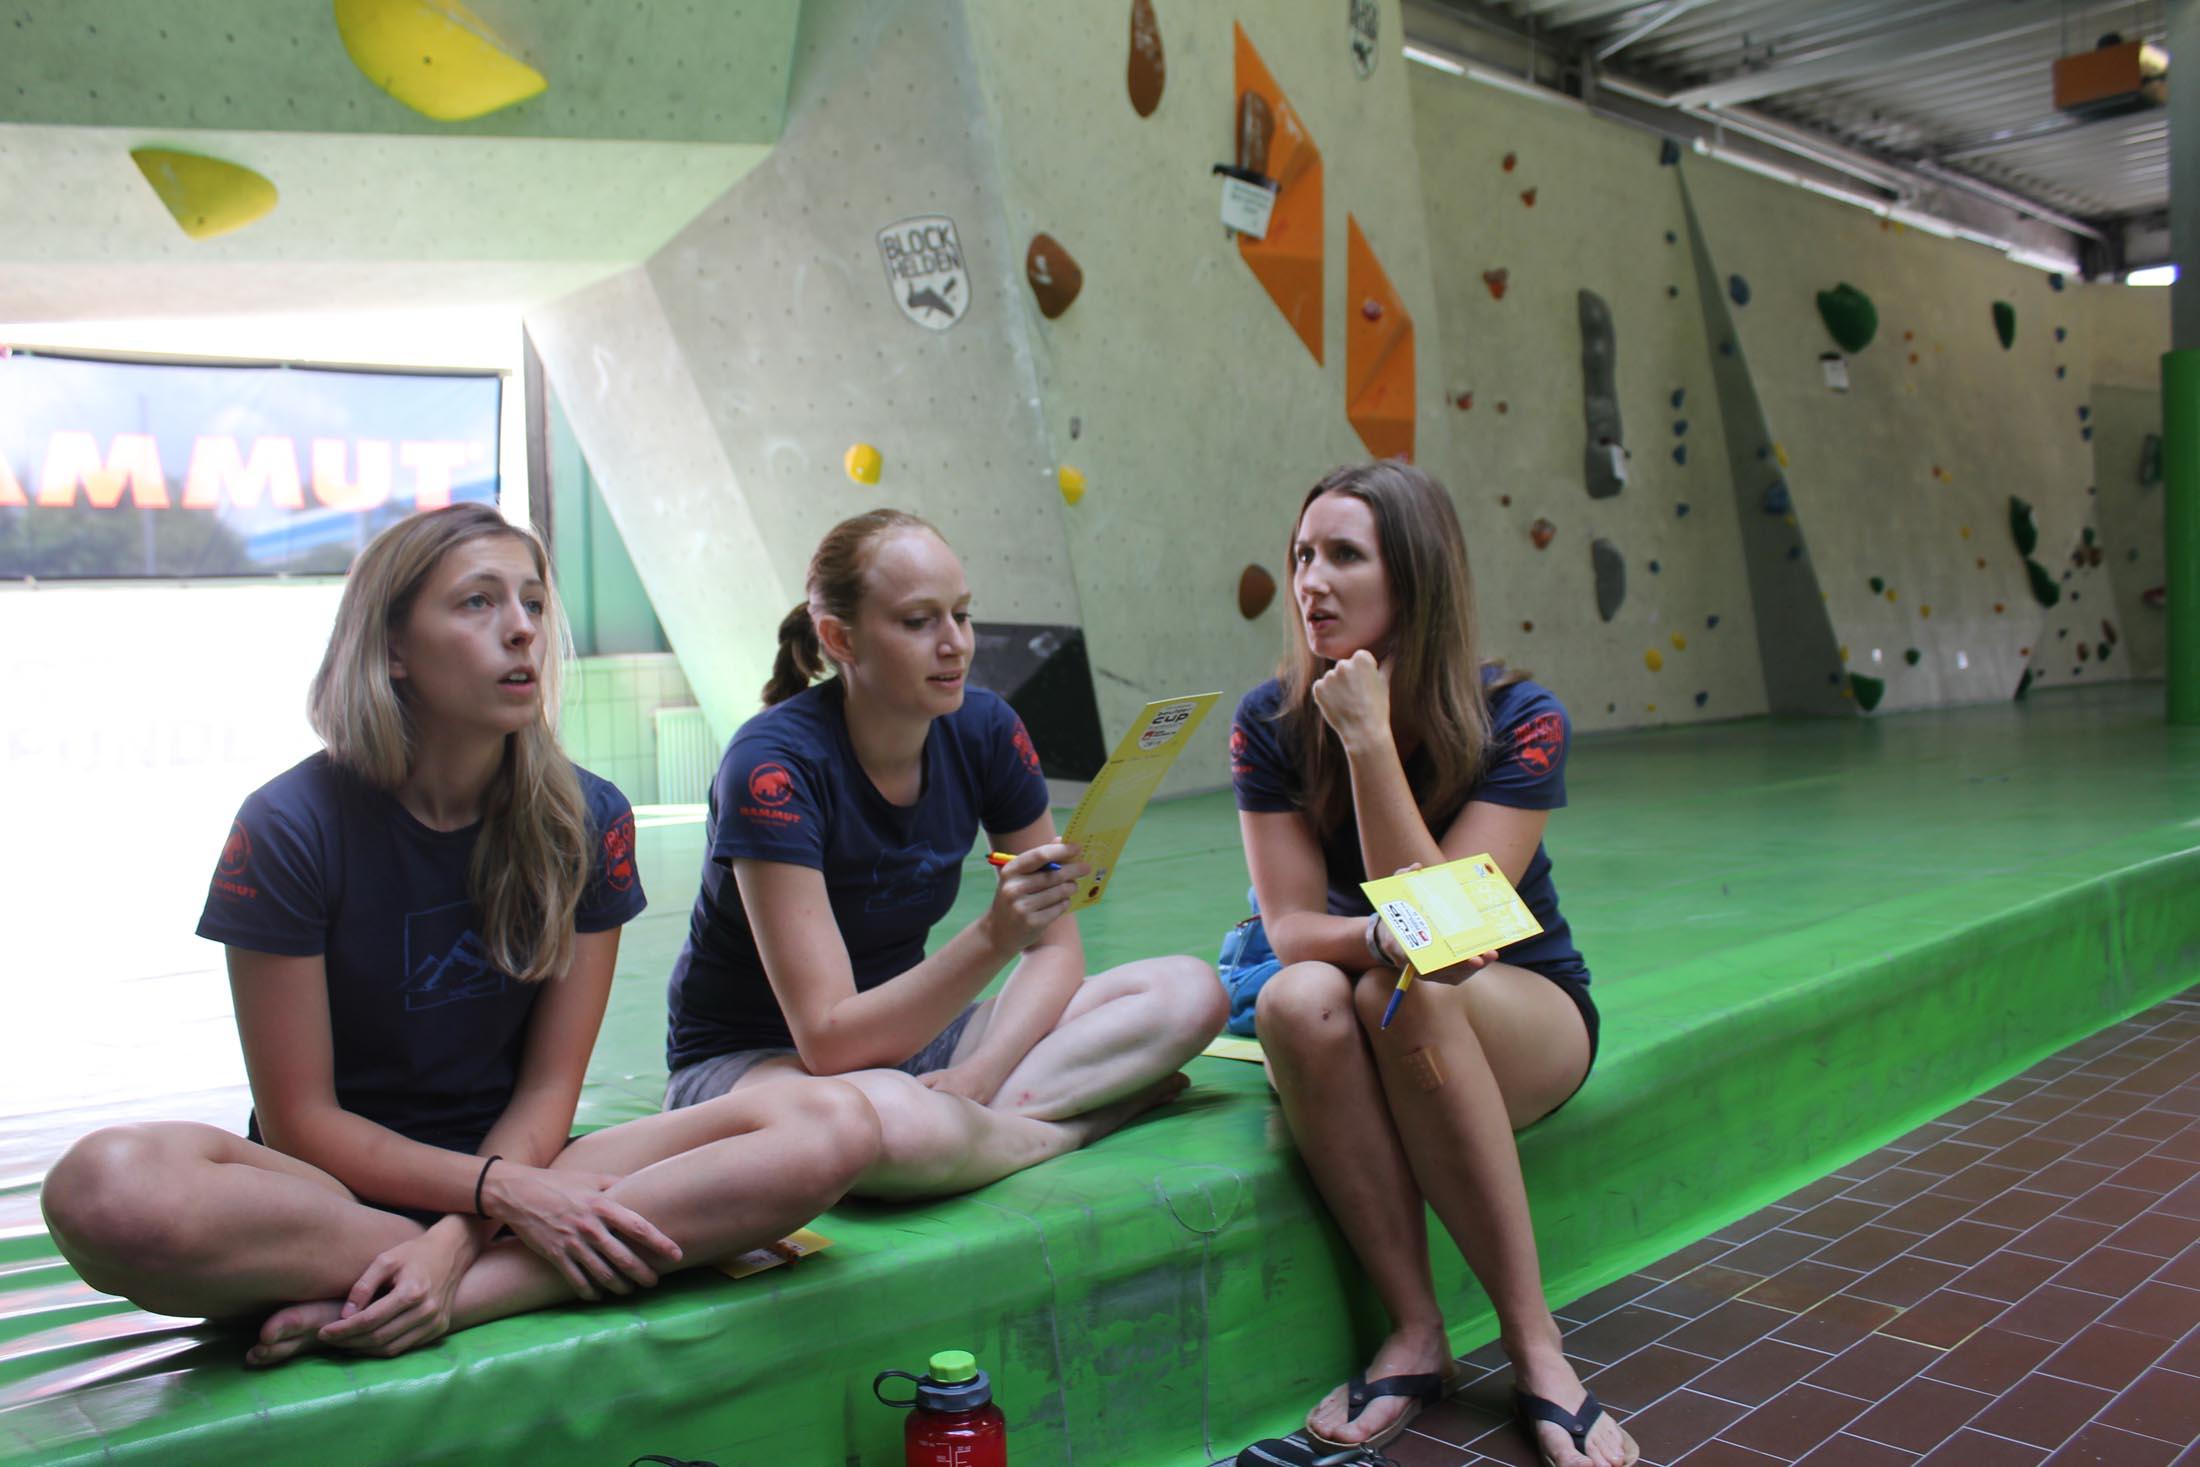 Registration internationaler bouldercup Frankenjura 2016, BLOCKHELDEN Erlangen, Mammut, Bergfreunde.de, Boulderwettkampf07092016072